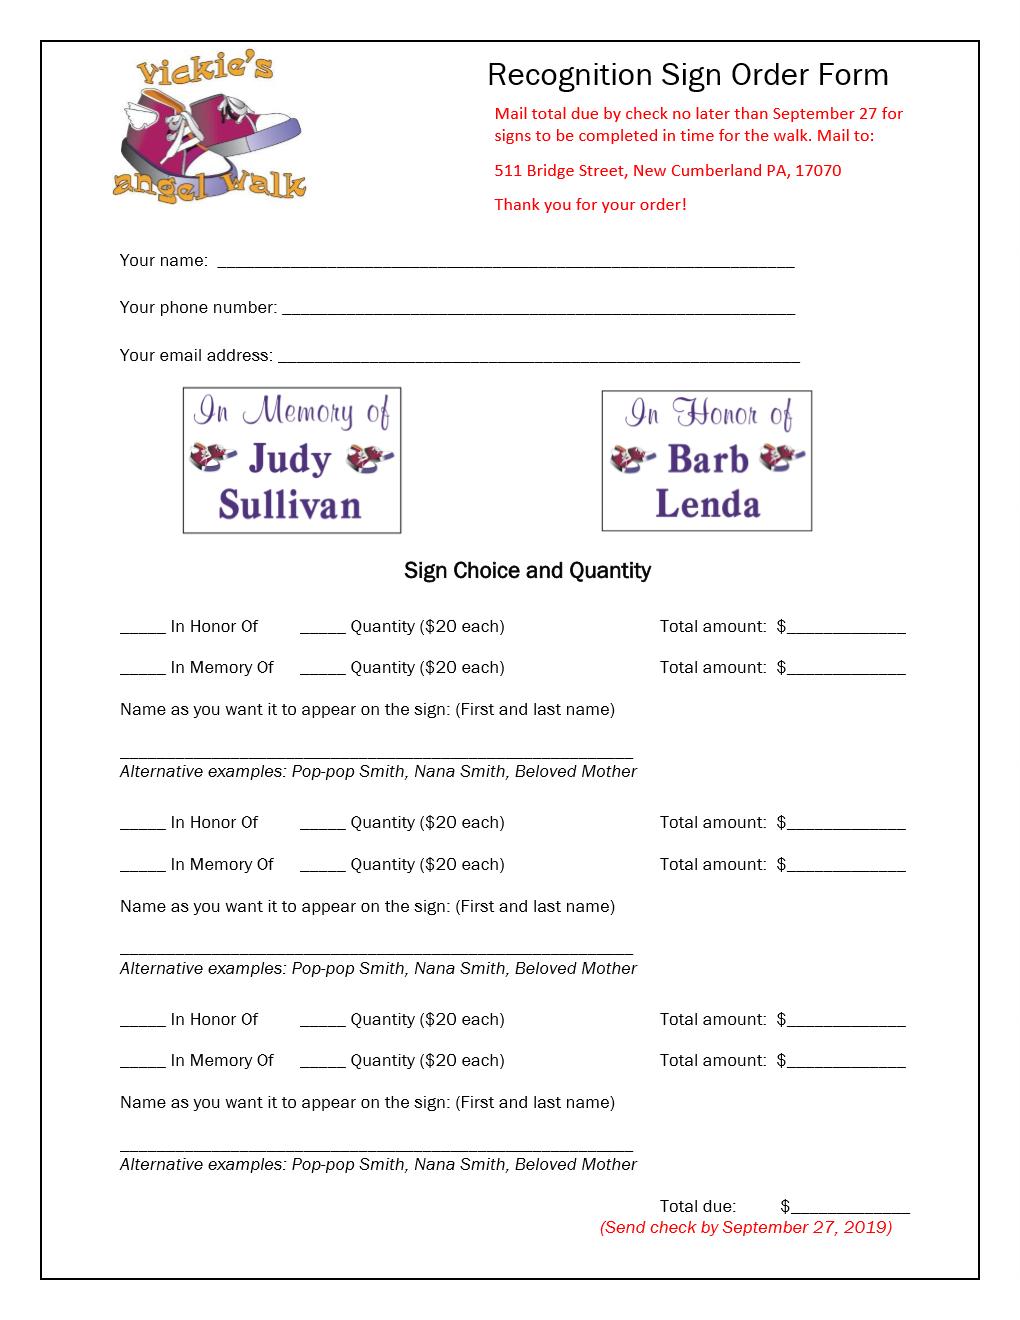 Memorial Signs Order Form_1.png